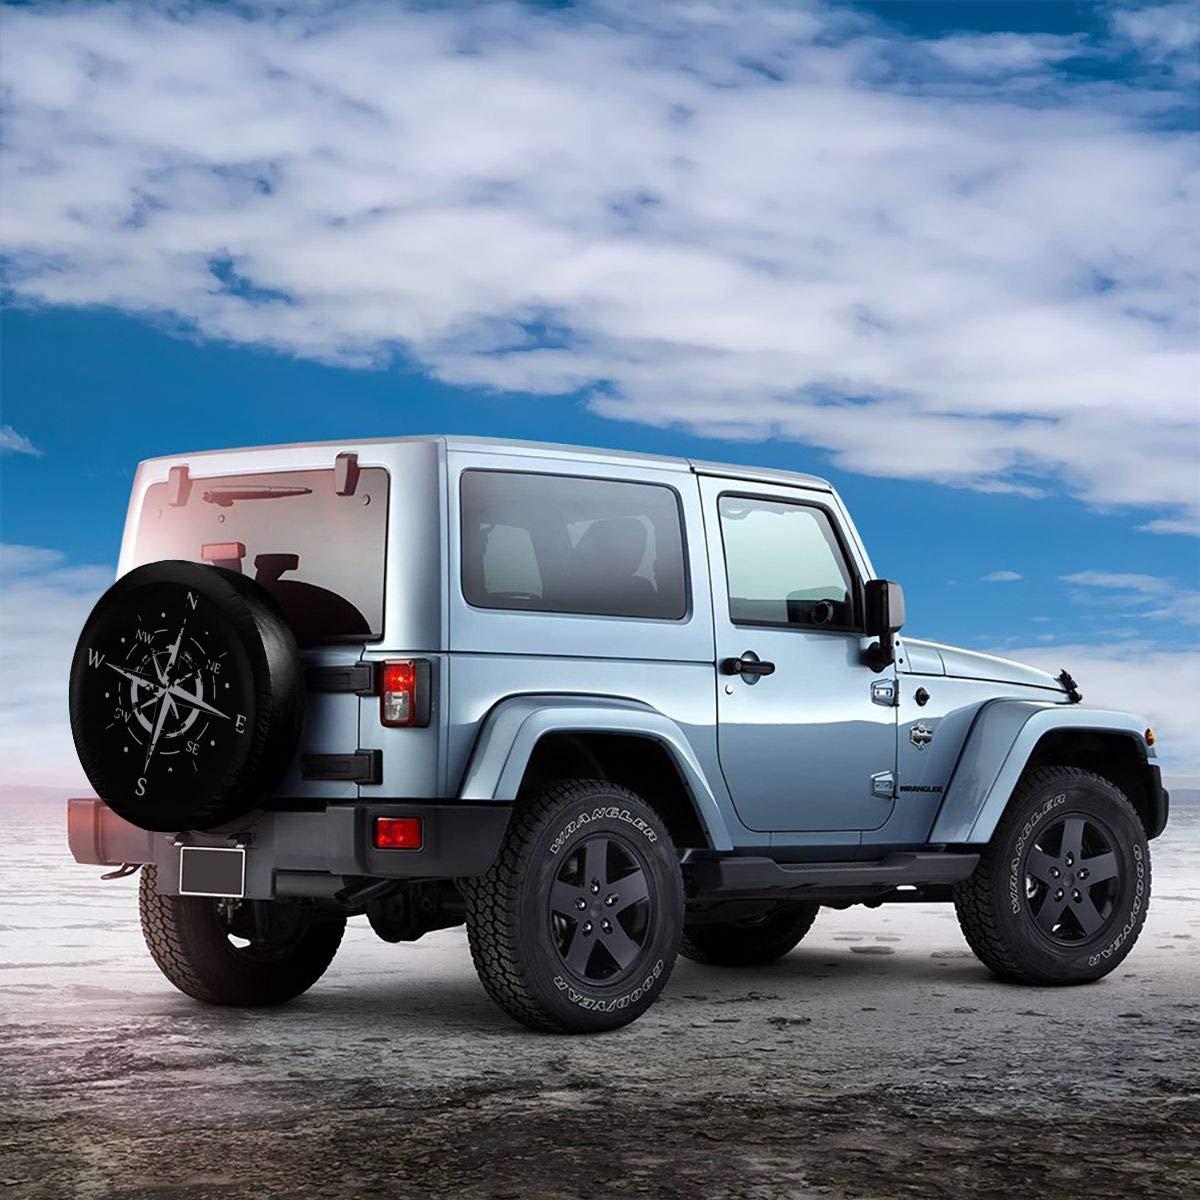 Compass Spare Tire Cover for RV SUV Wheel